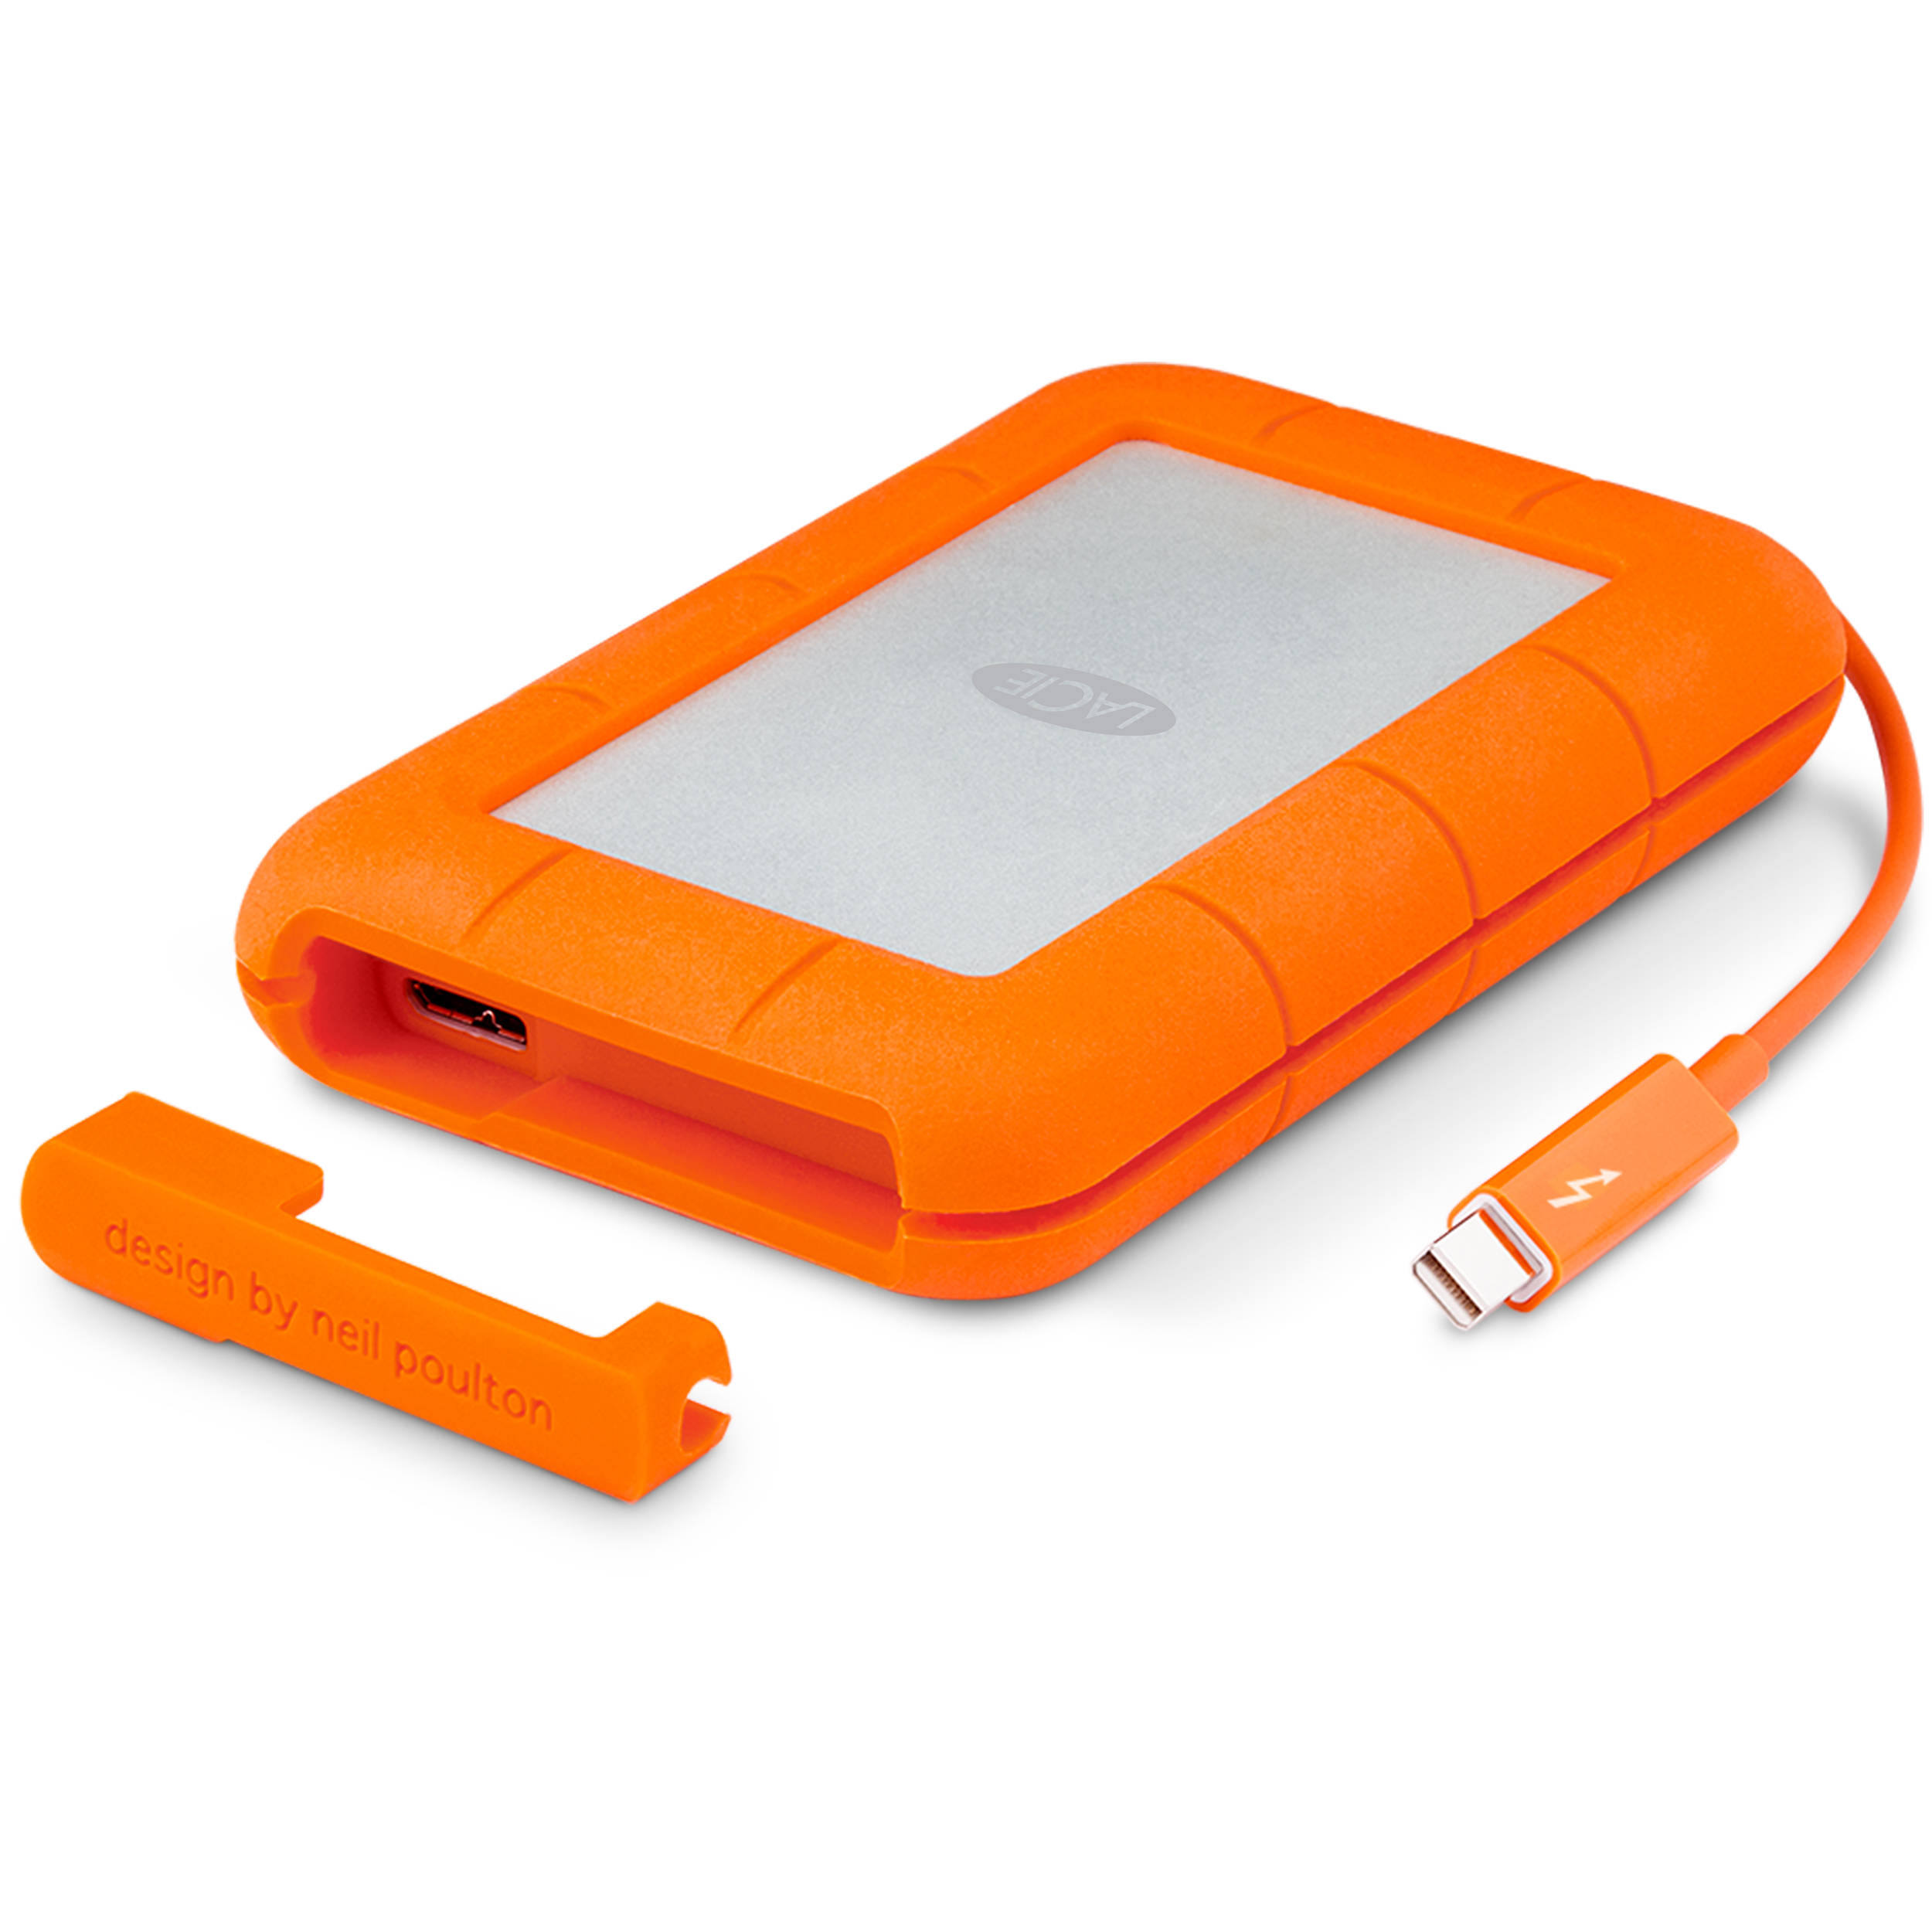 7fdfe2311d0a LaCie 1TB Rugged Mobile Hard Drive (Thunderbolt & Micro-USB ...